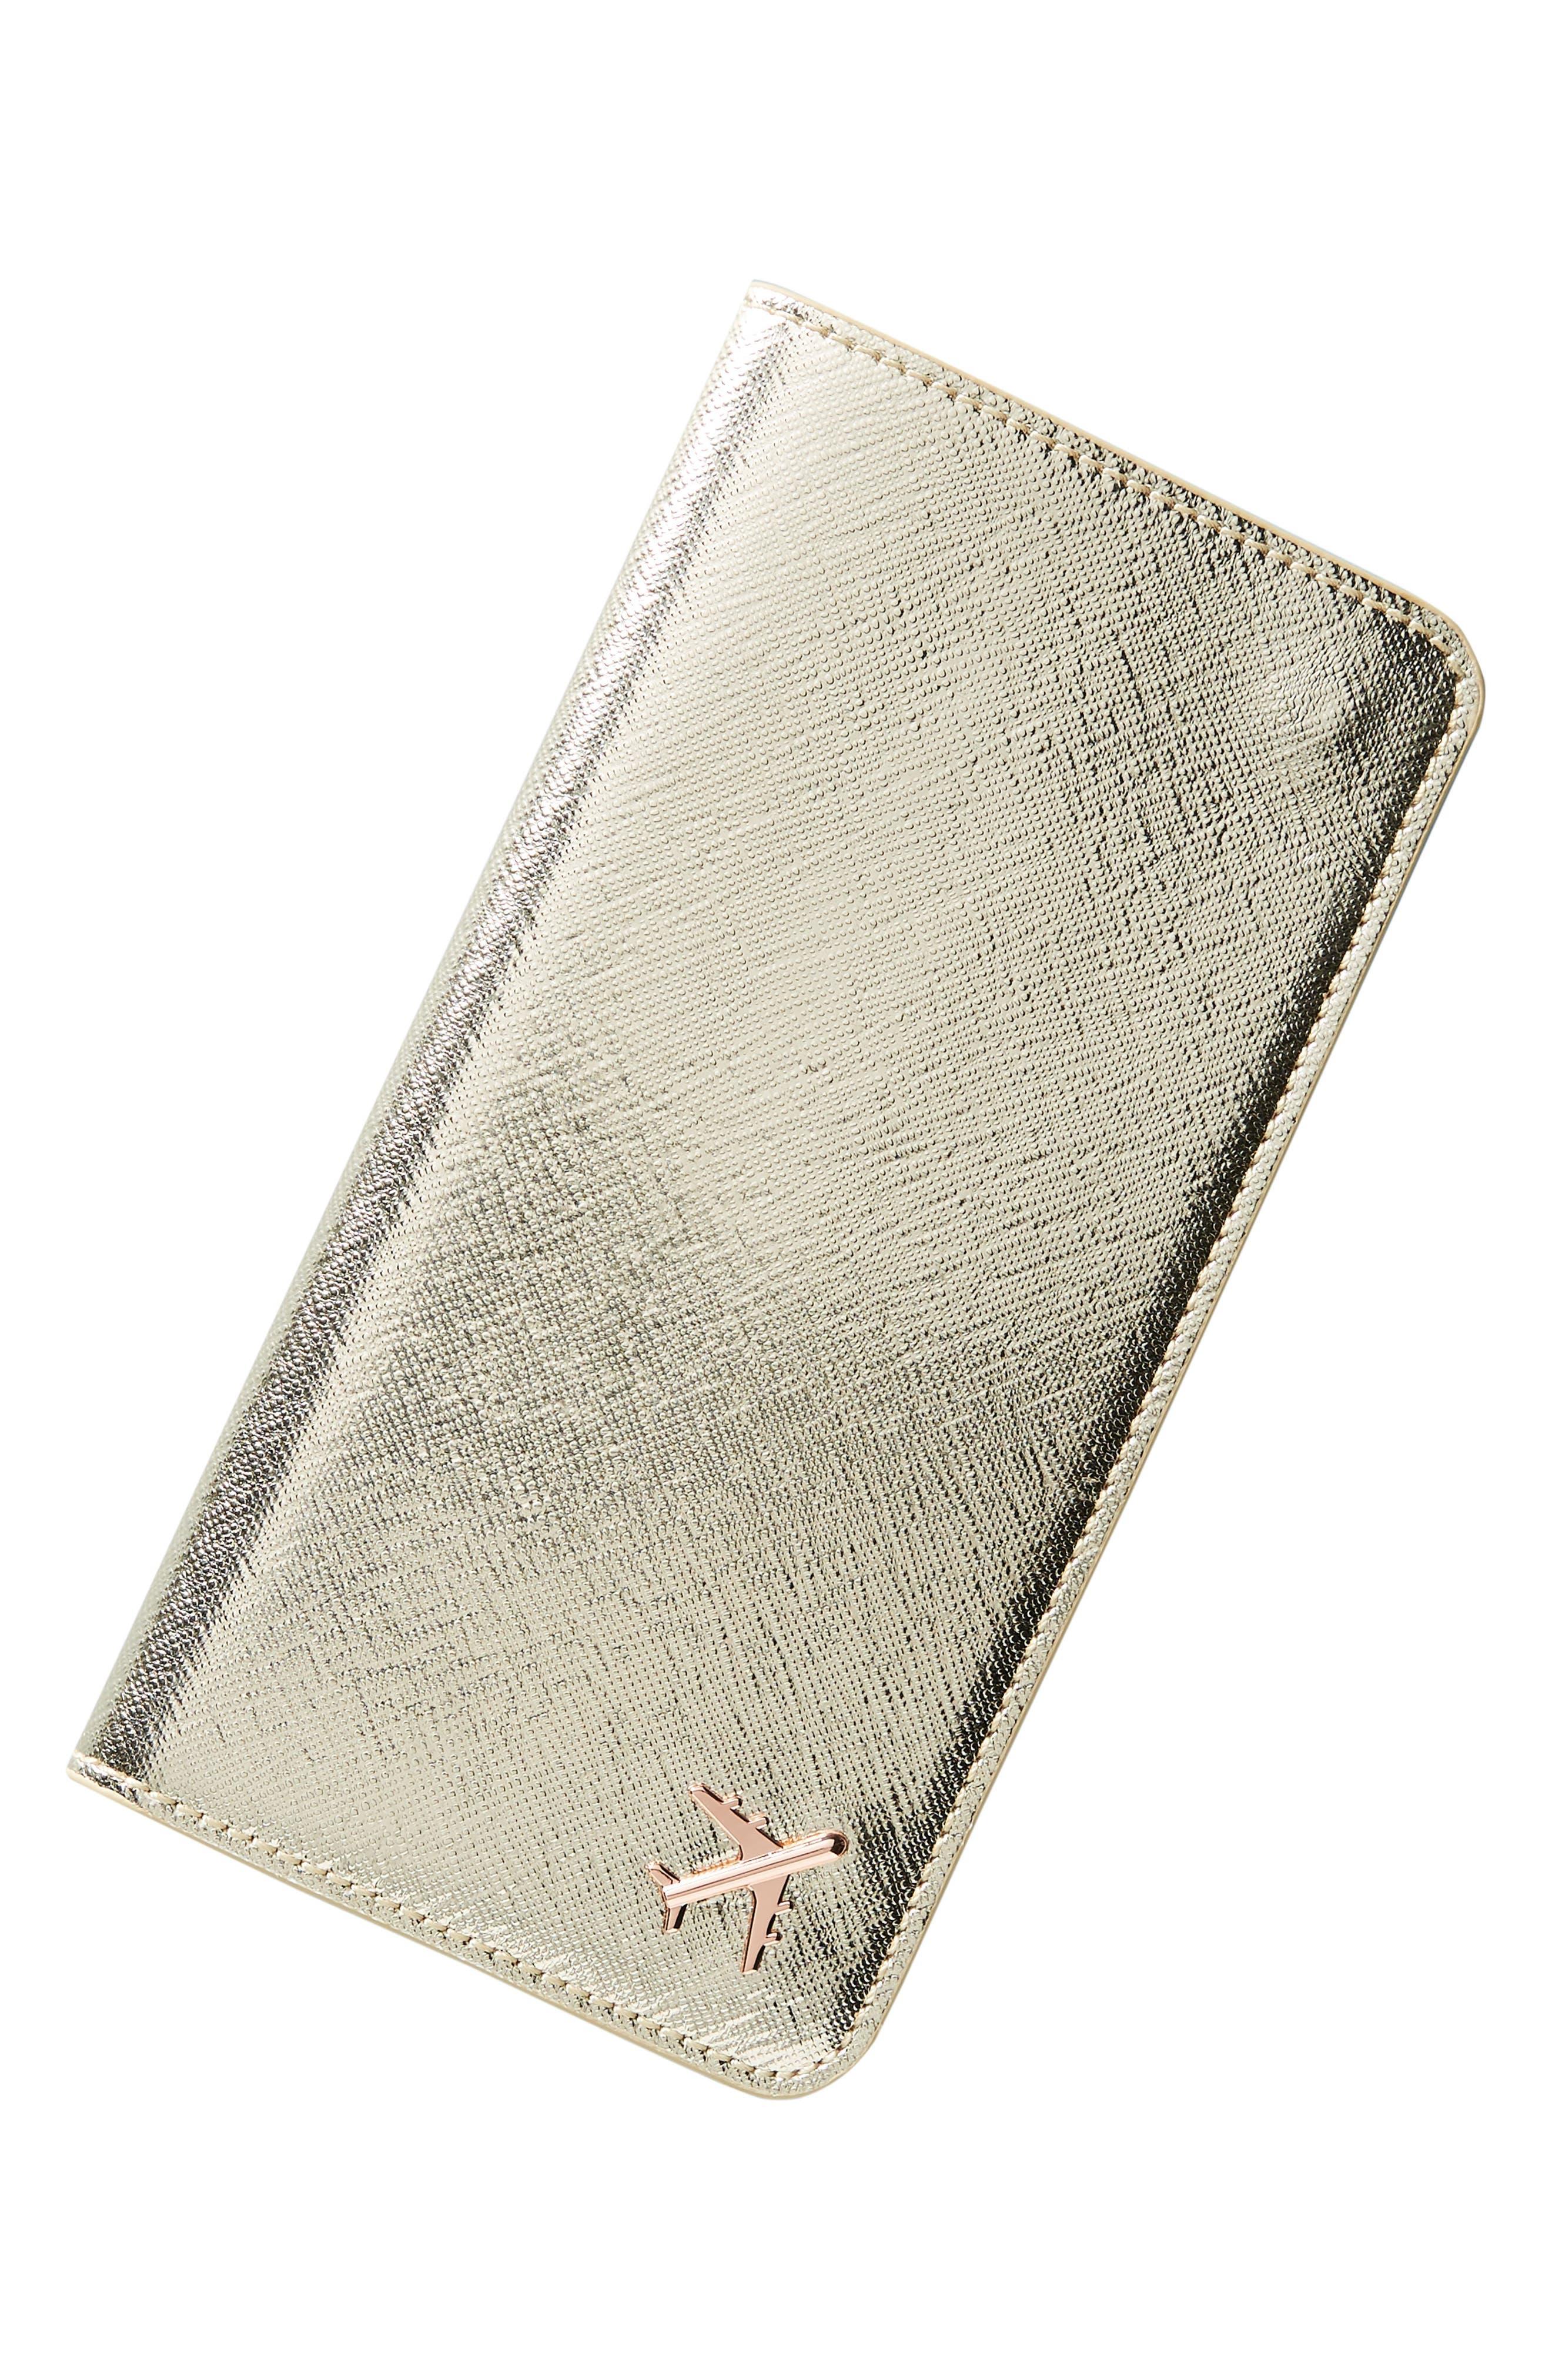 Celeste Travel Wallet,                             Alternate thumbnail 4, color,                             GOLD